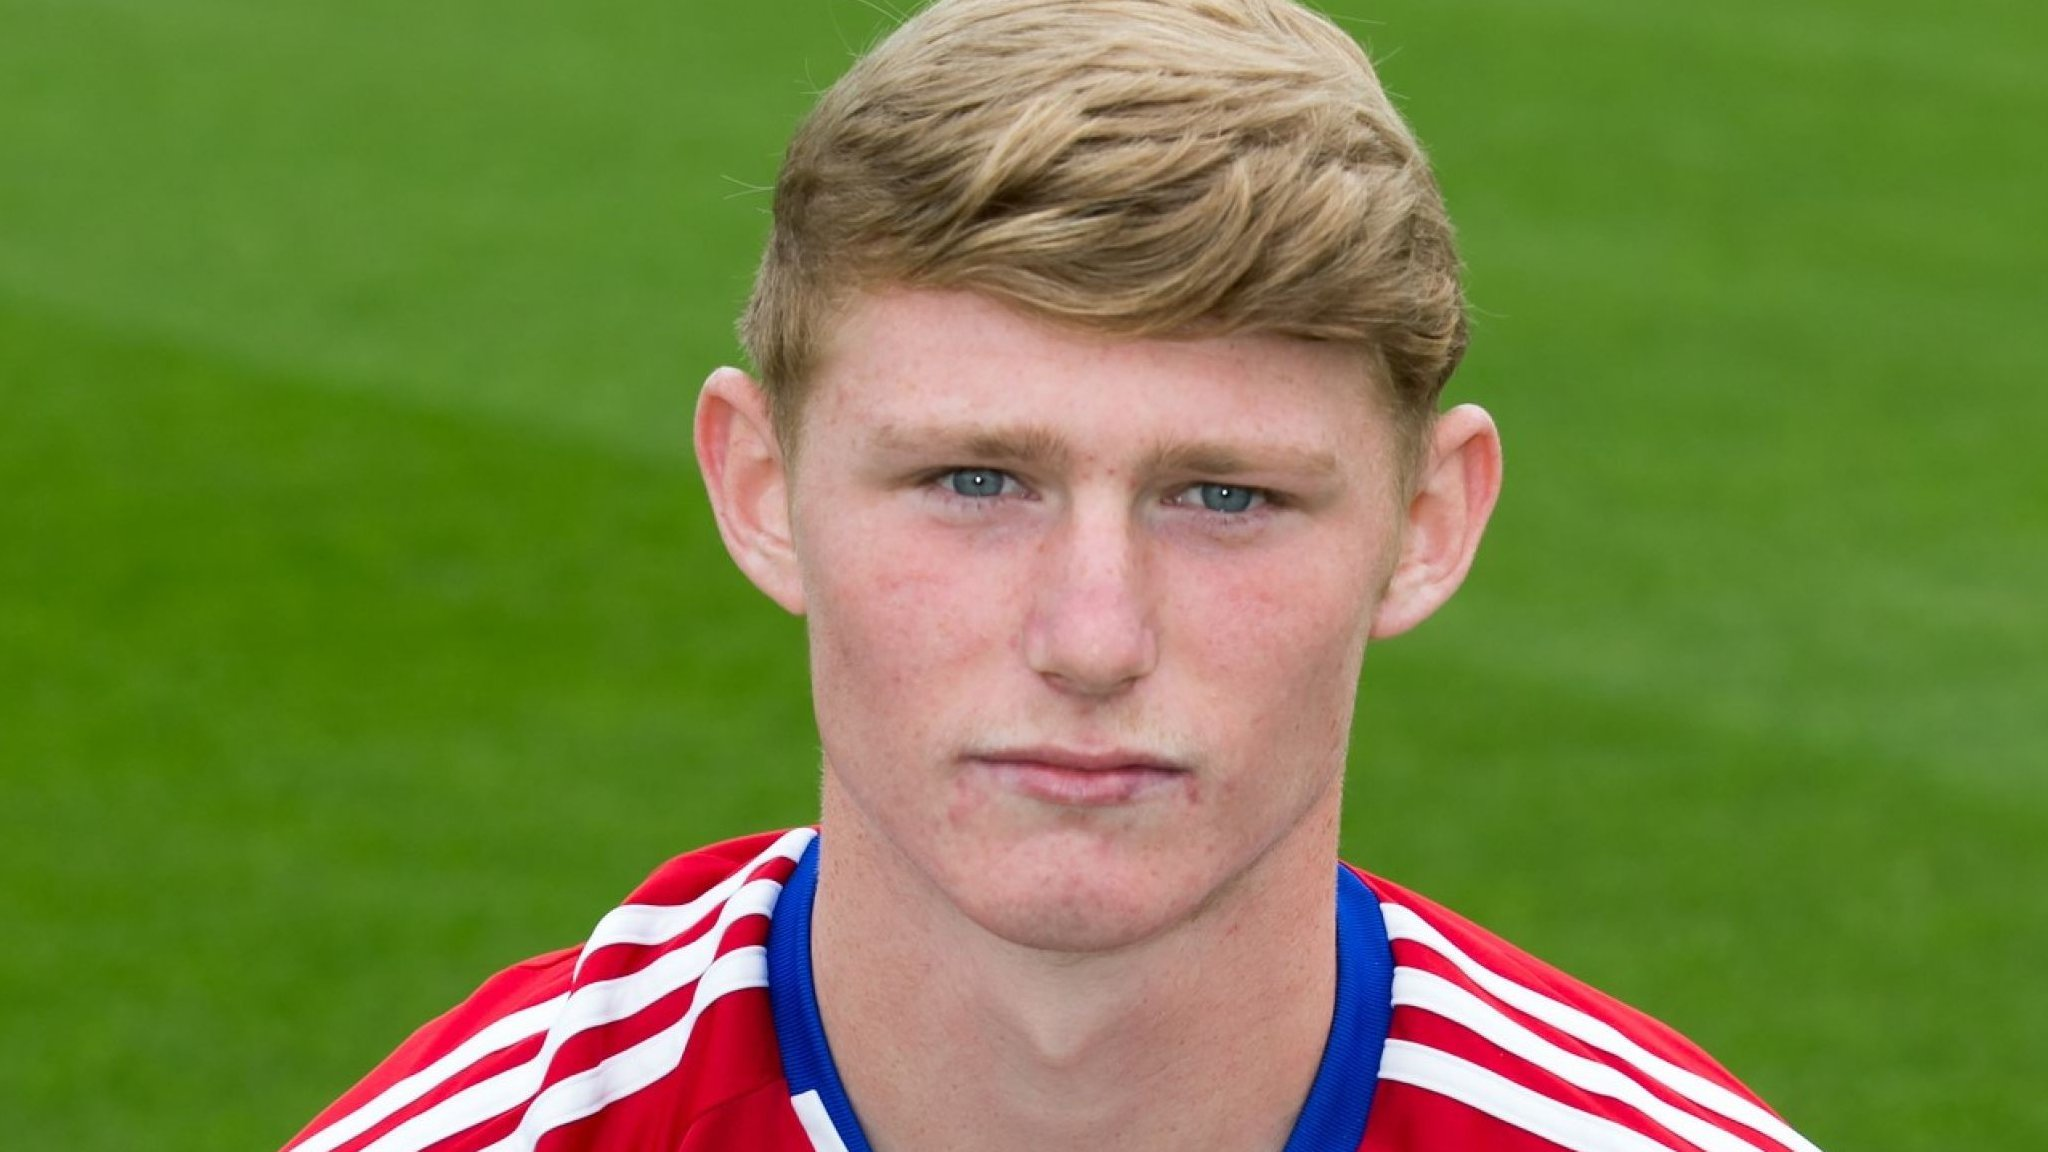 Anthony Renton: Middlesbrough teenage defender diagnosed with leukaemia